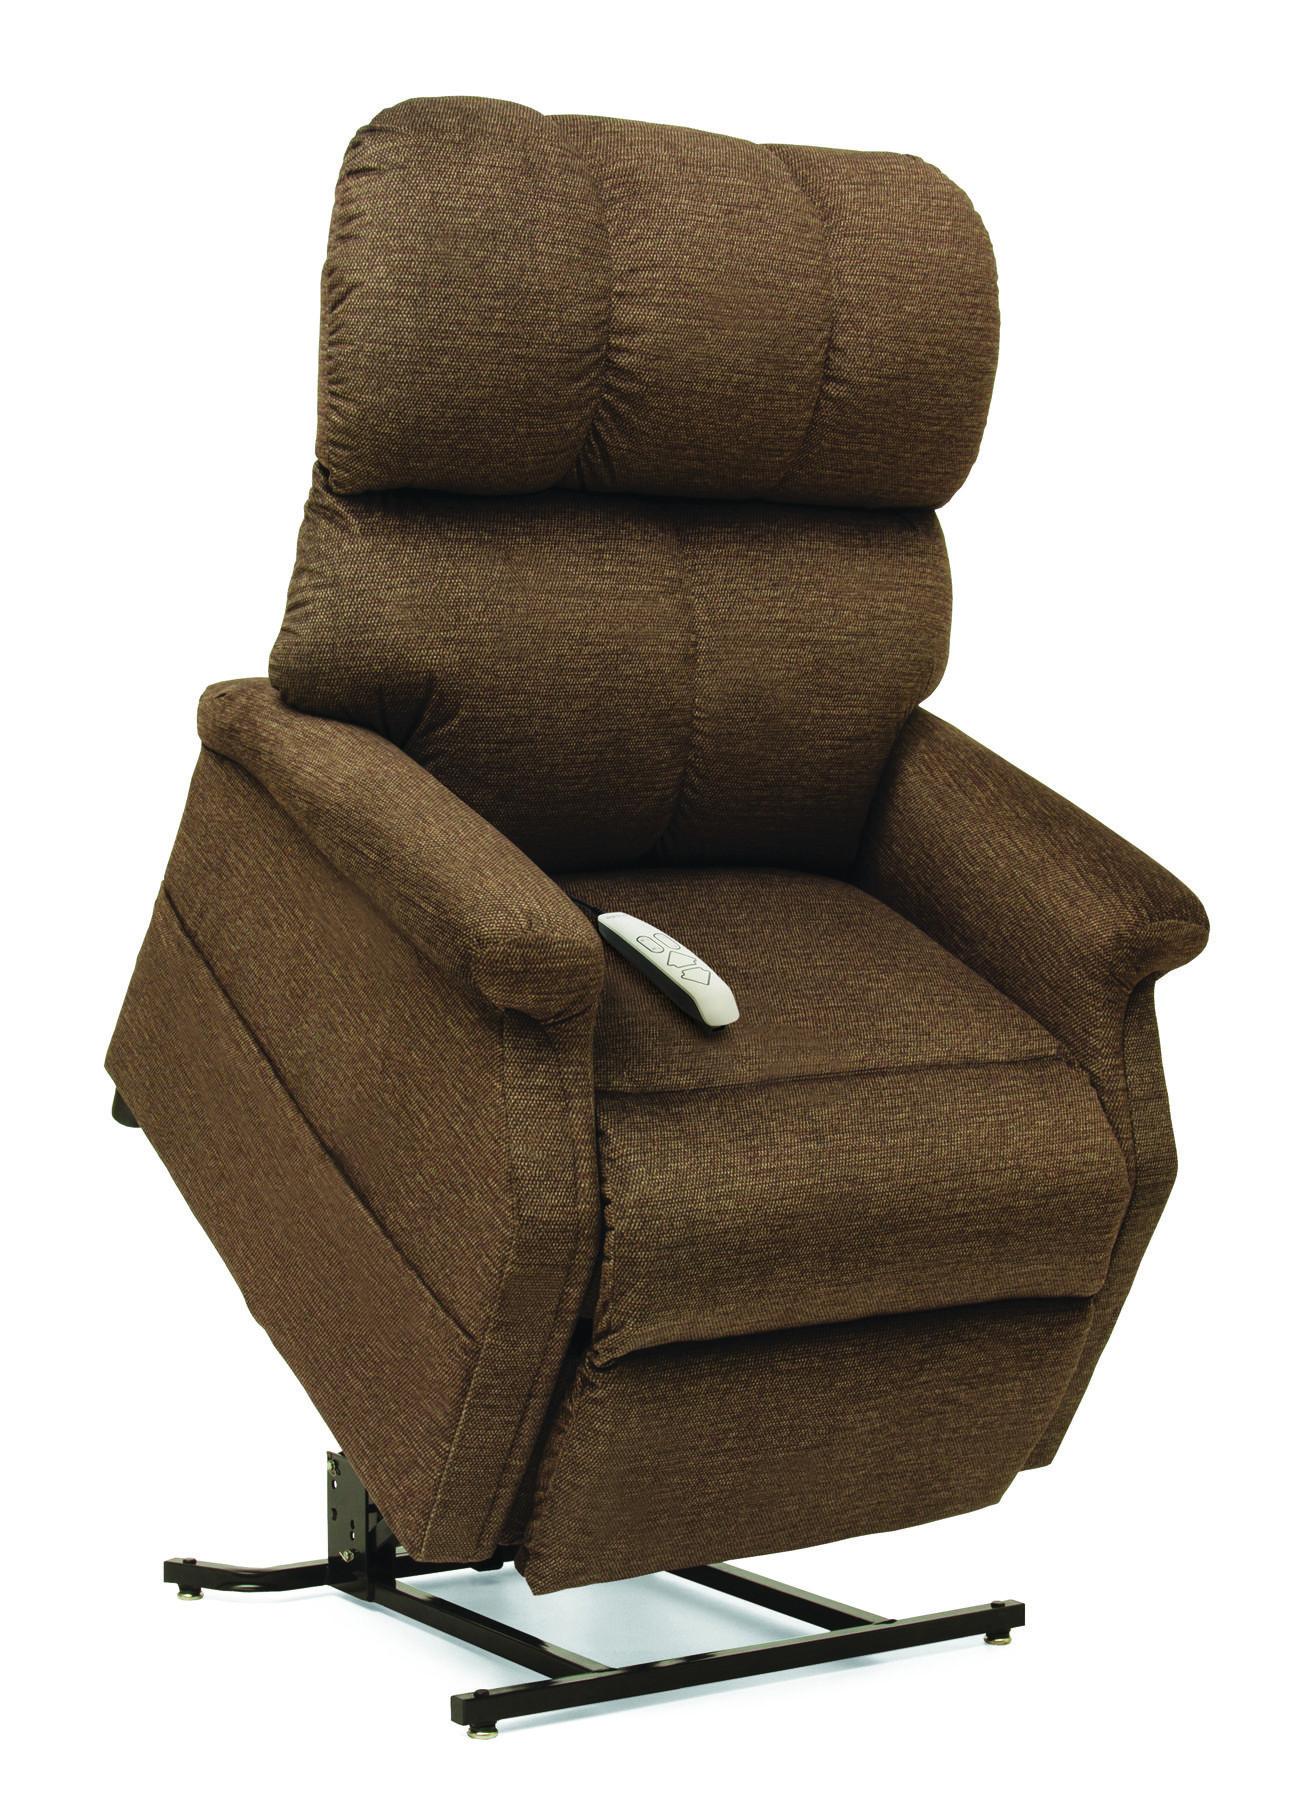 Pride Lift Chairs Power Chair Nz Arm